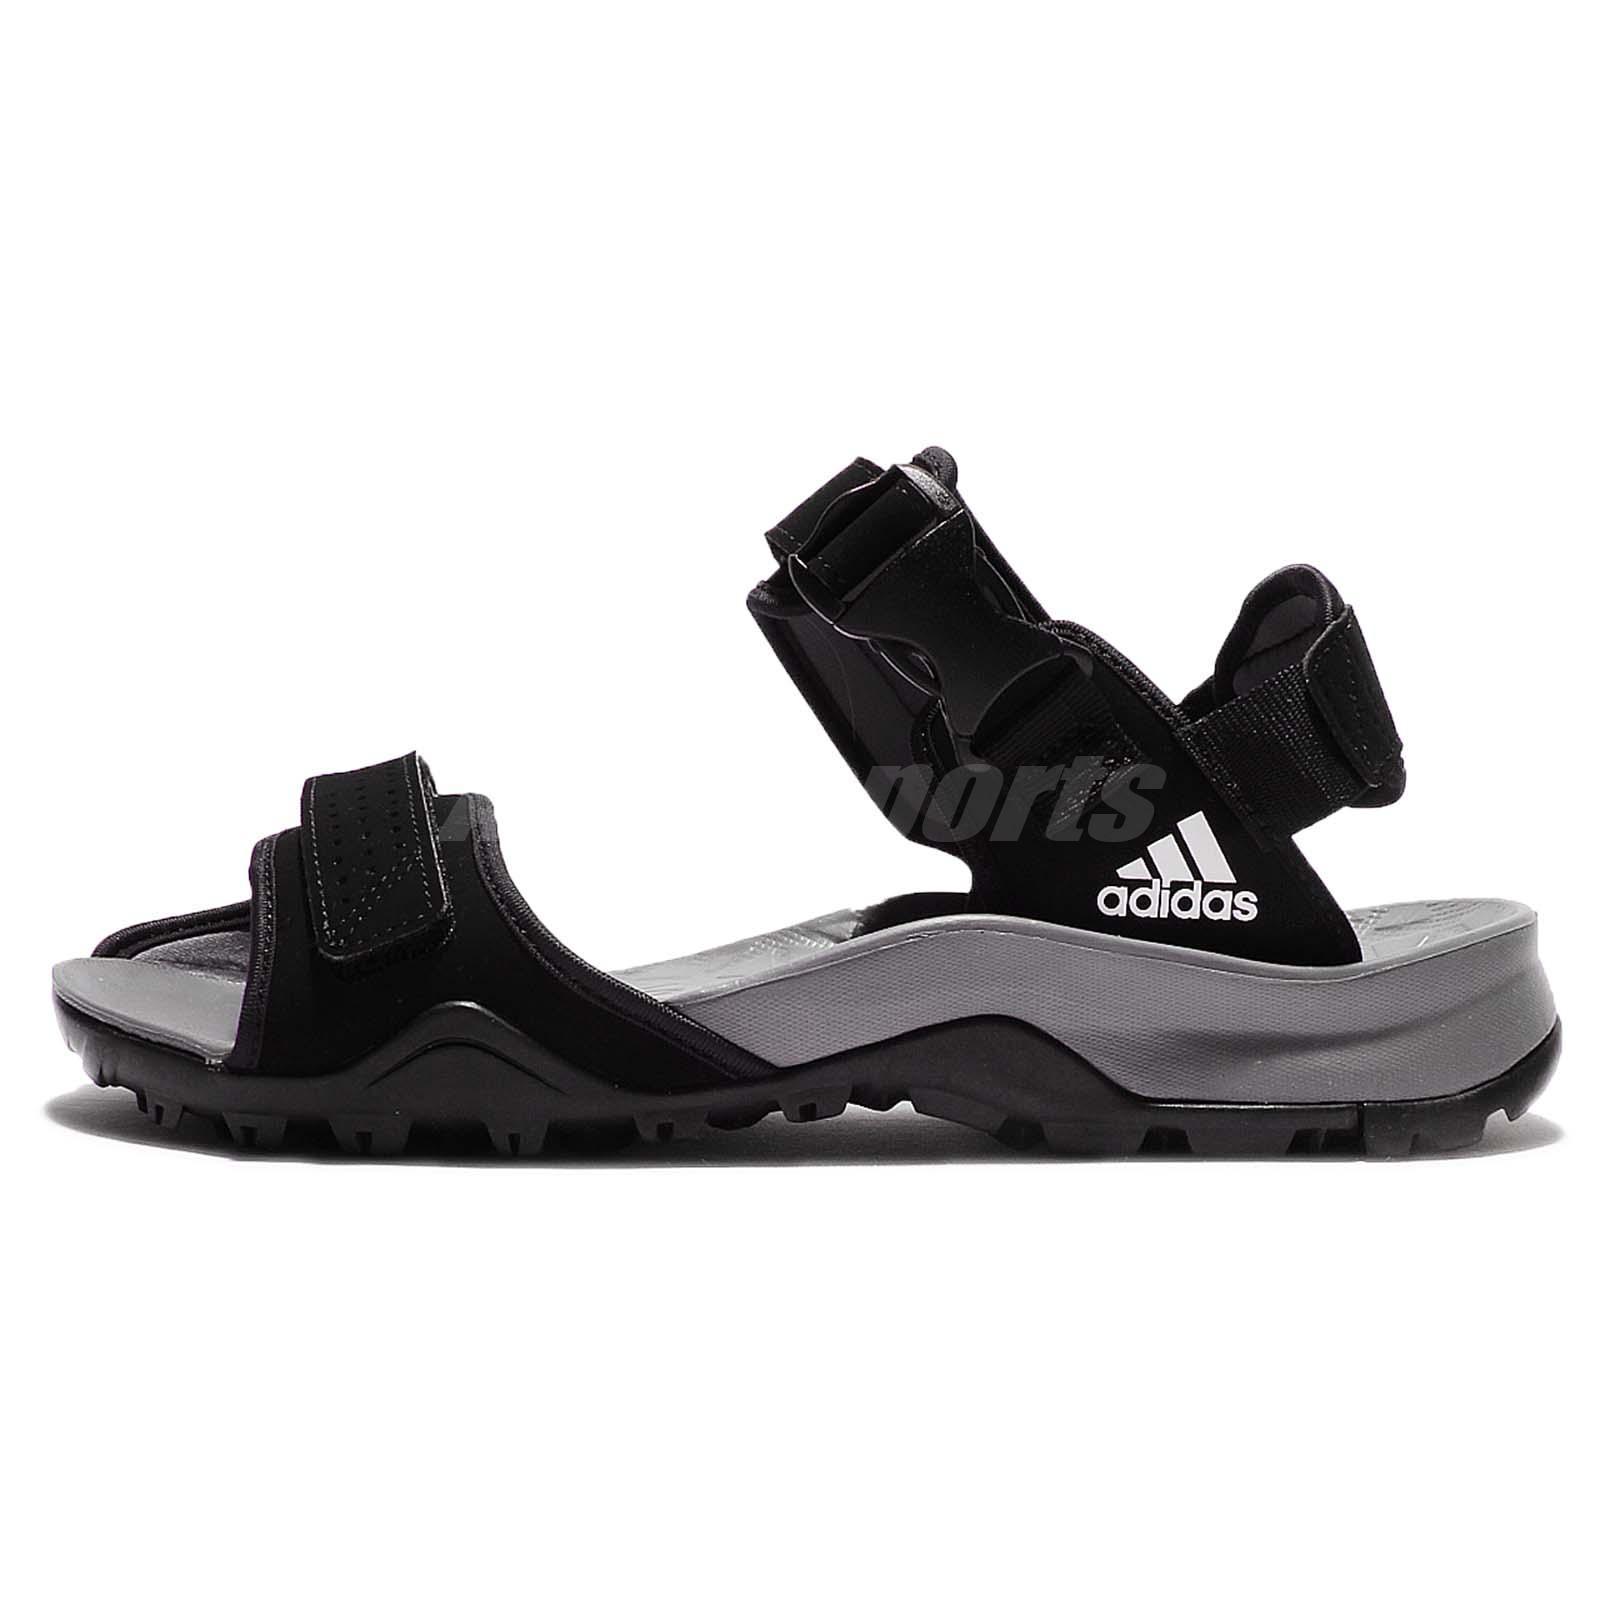 save off 746d3 0e550 adidas Cyprex Ultra Sandal II 2 Black Grey Men Outdoor Hiking Sandals B44191